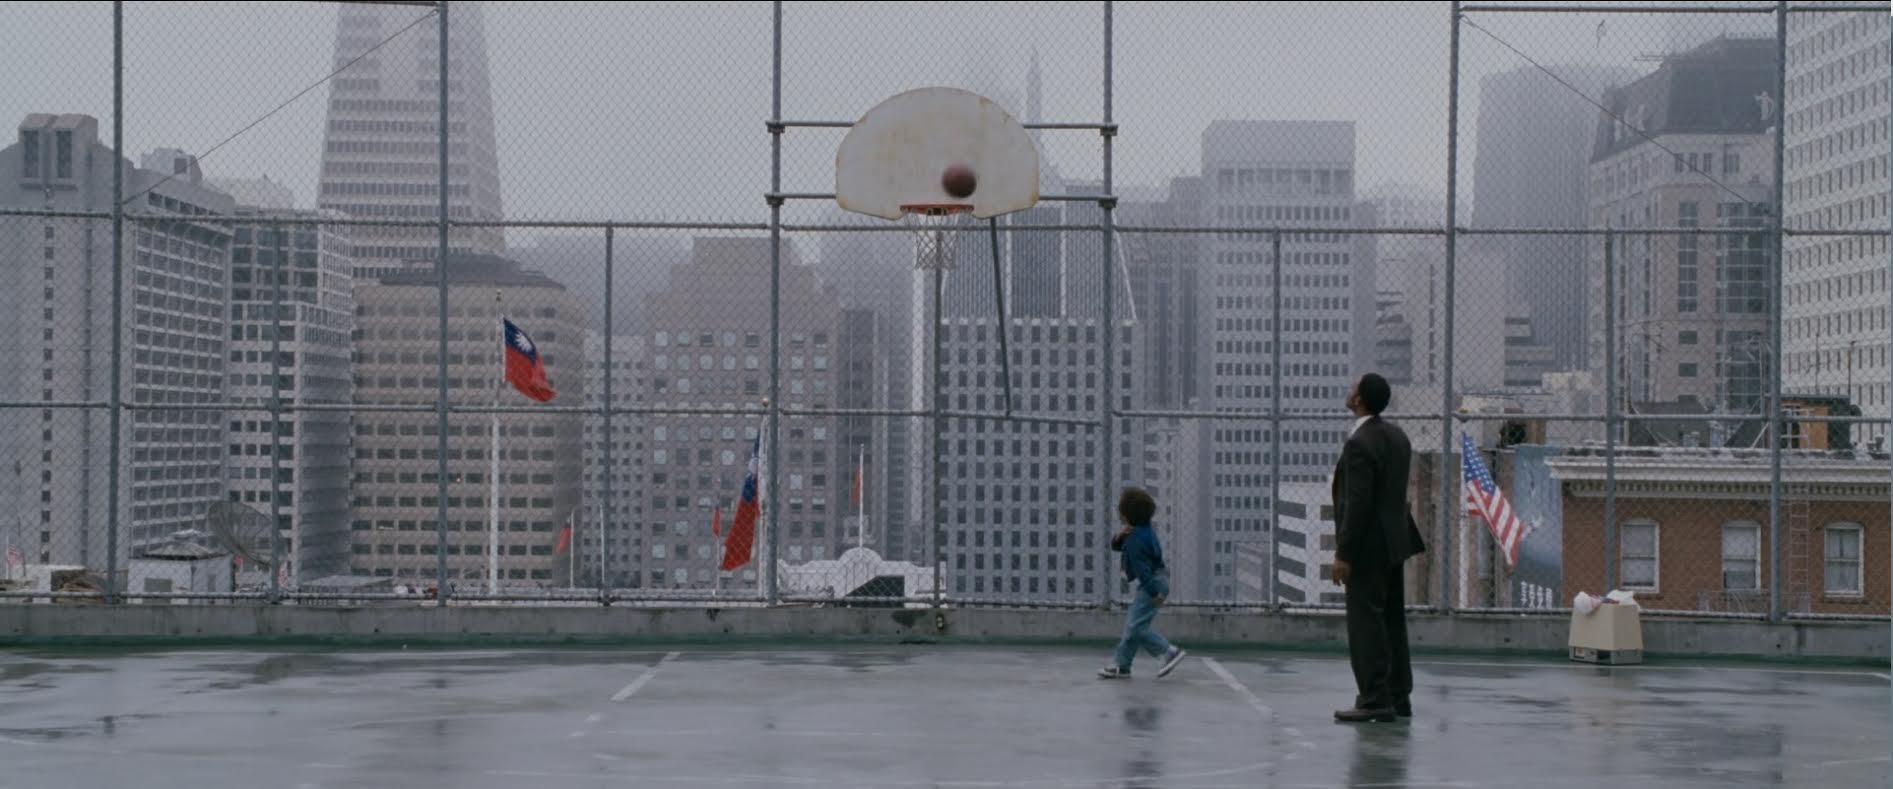 cena-basquete